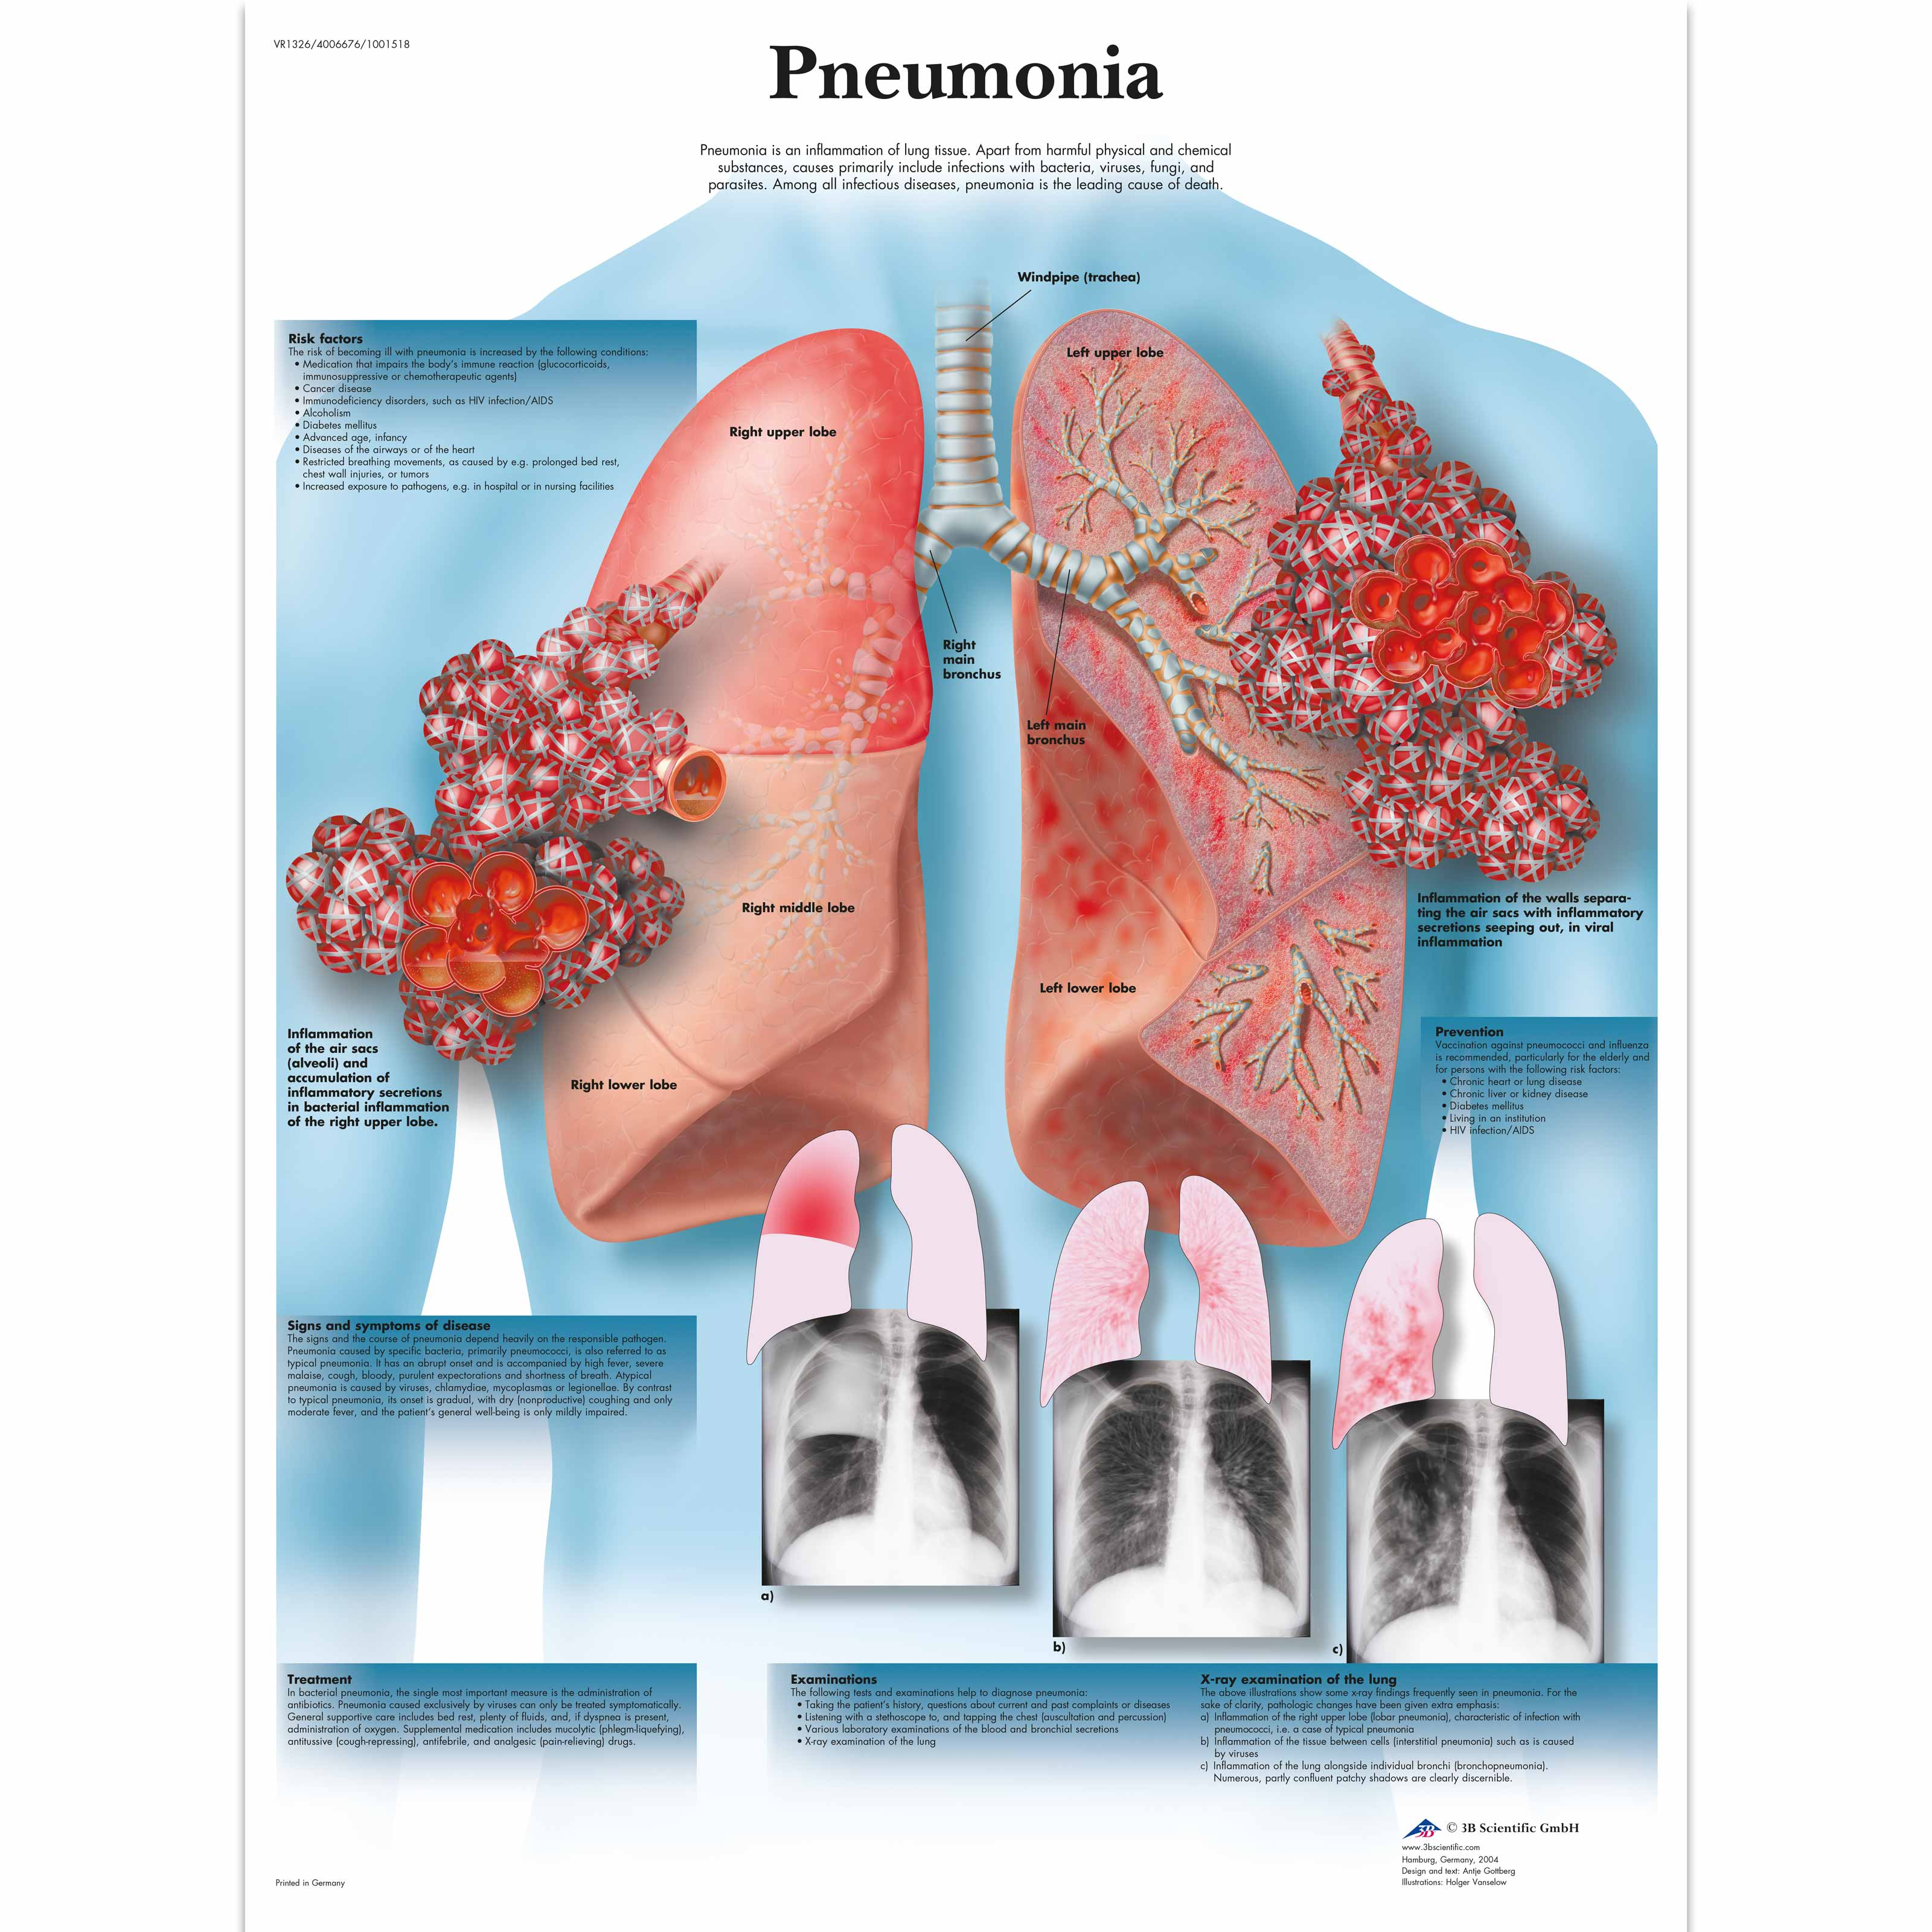 Pneumonia Chart - 4006676 - VR1326UU - Parasitic, Viral or Bacterial ...